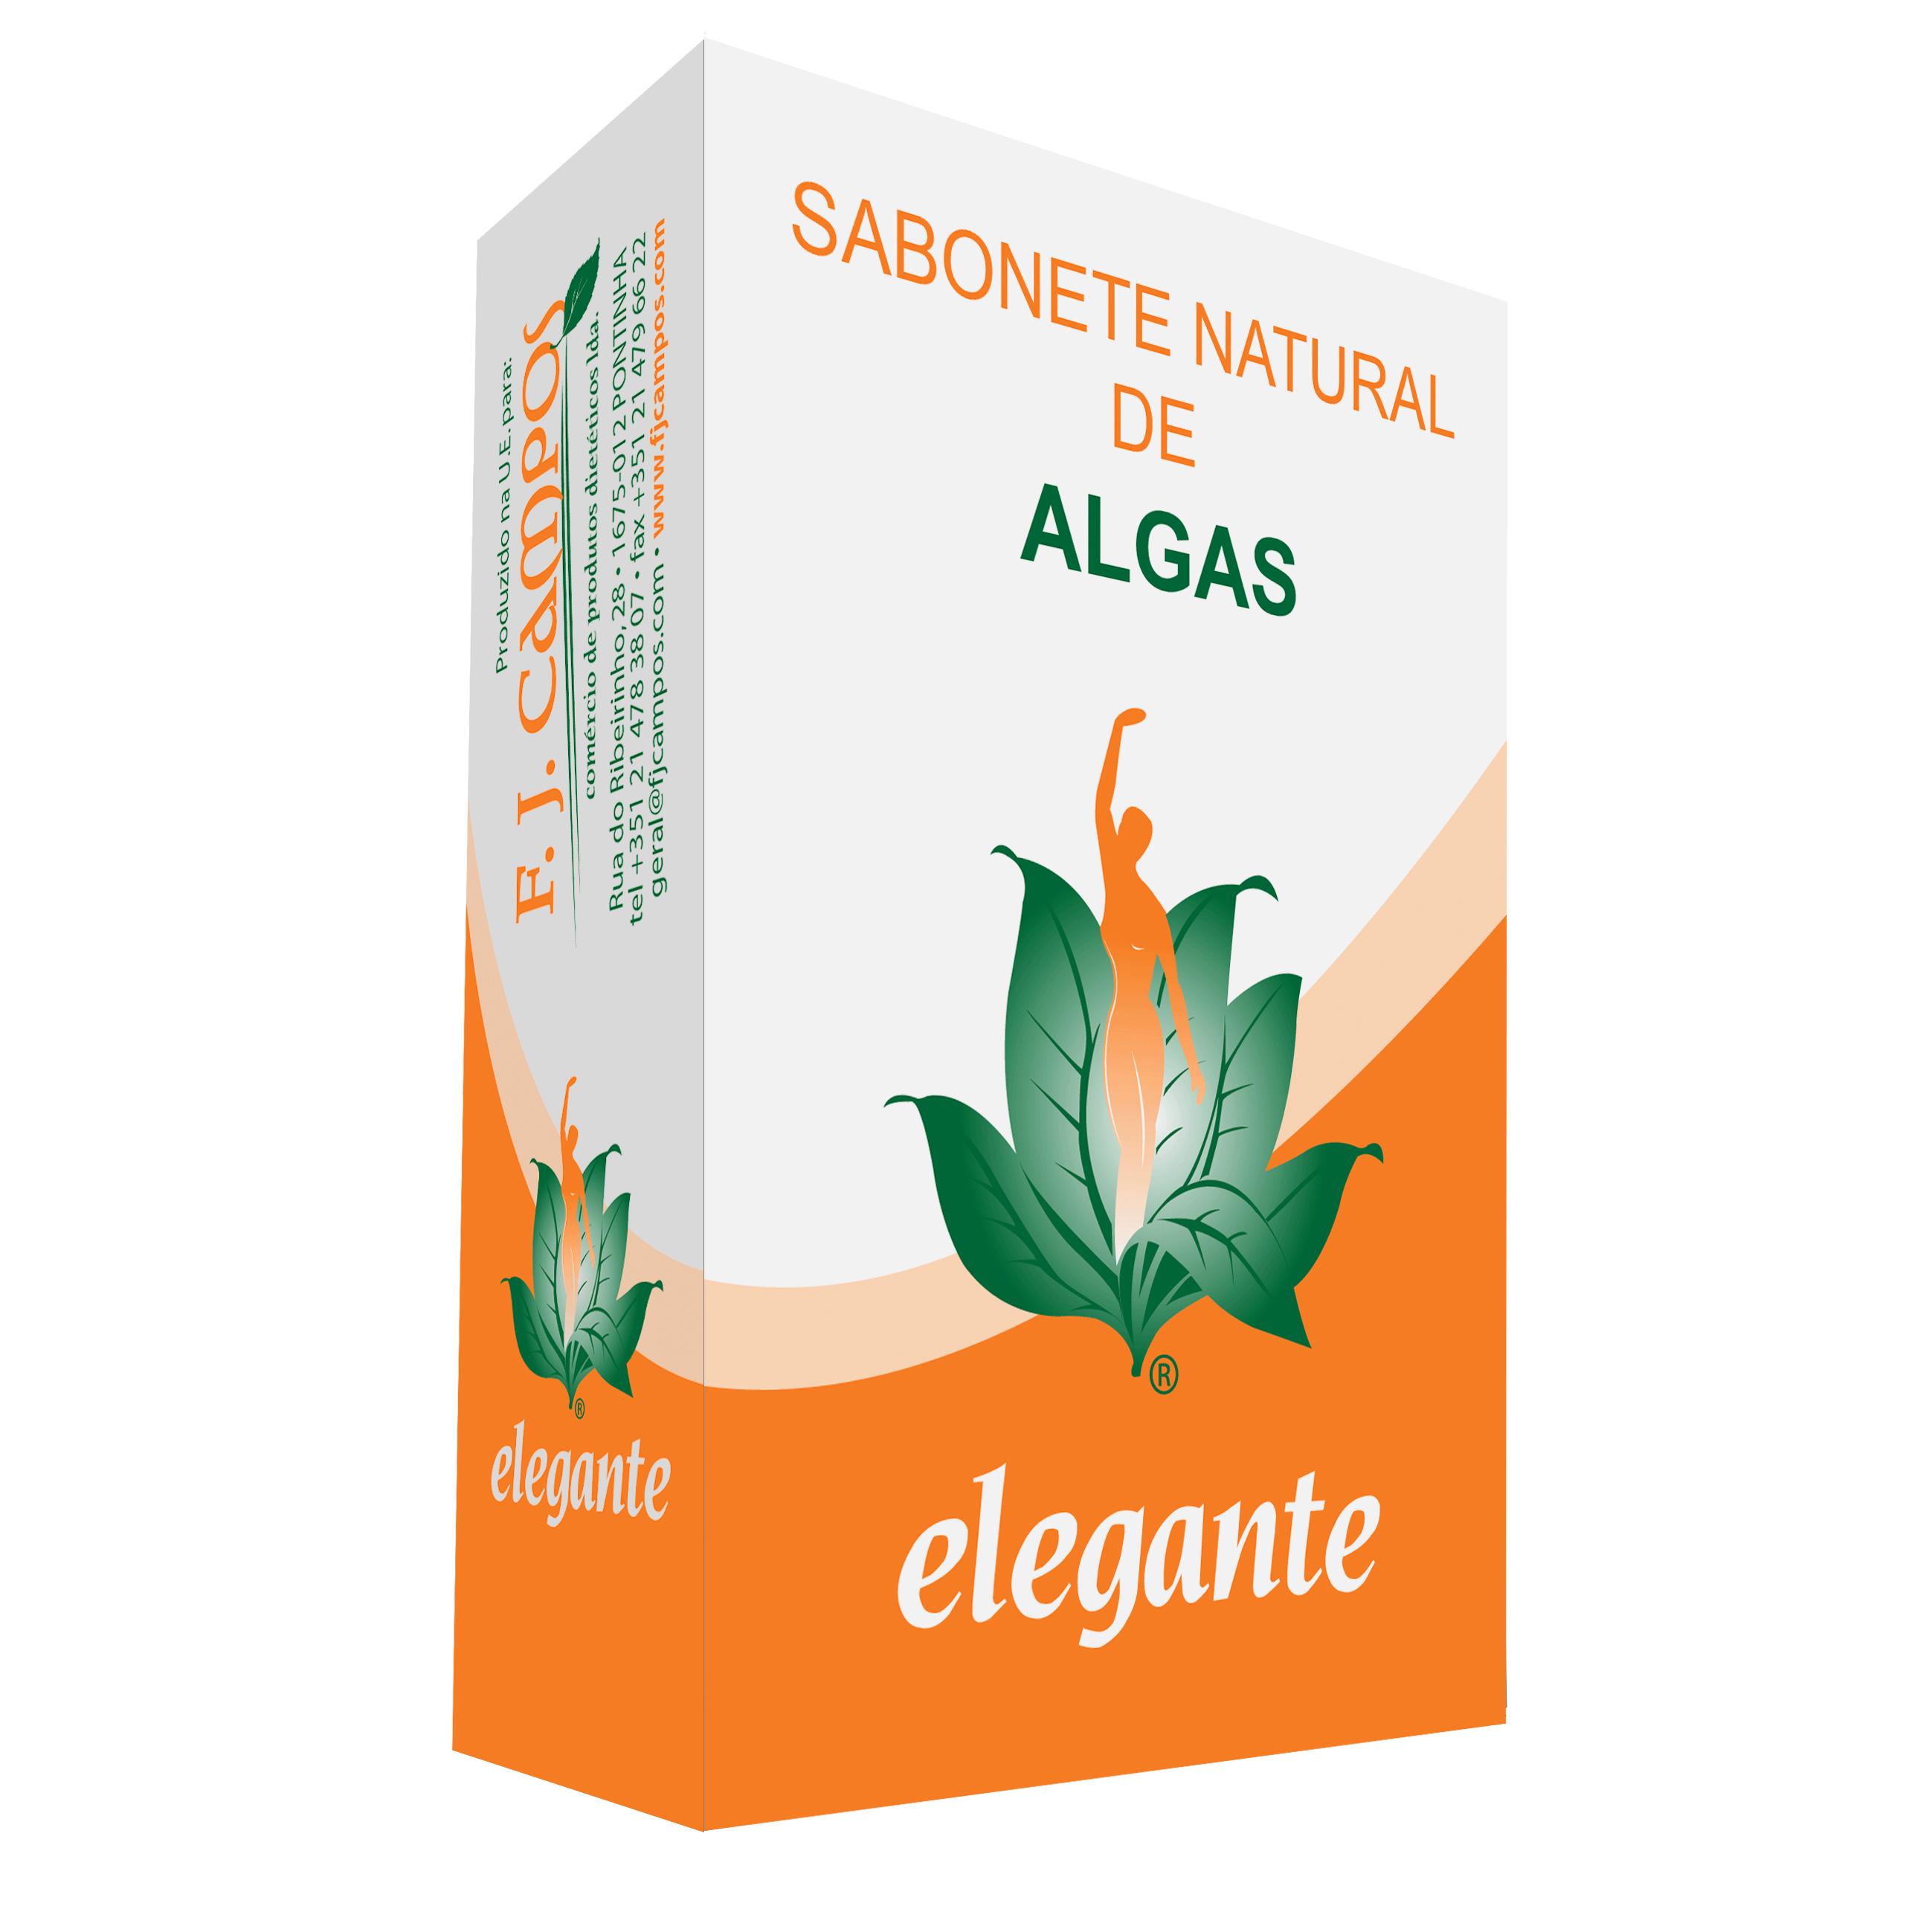 Sabonete Algas